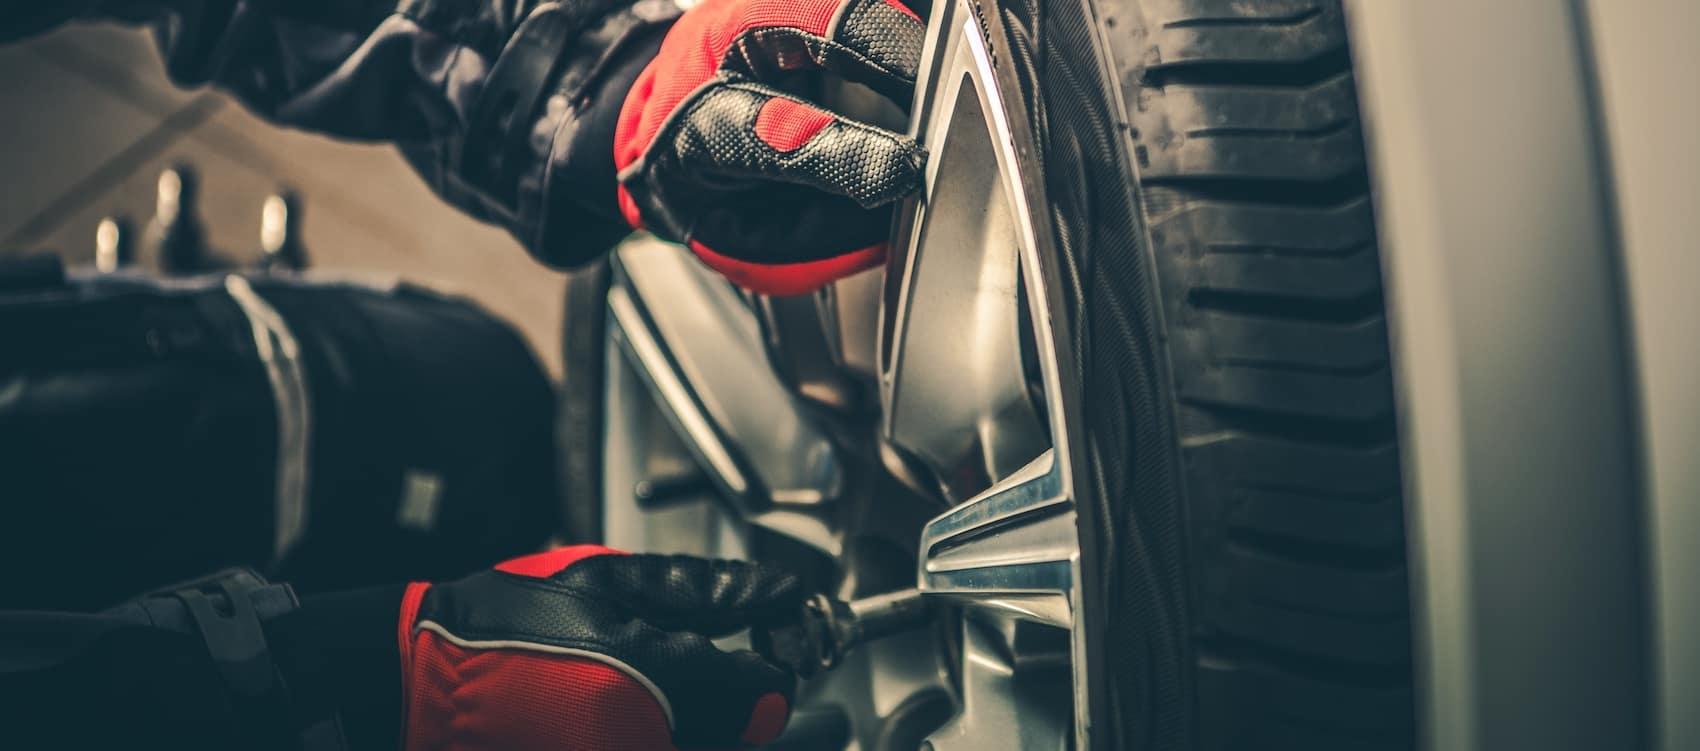 rotating tires